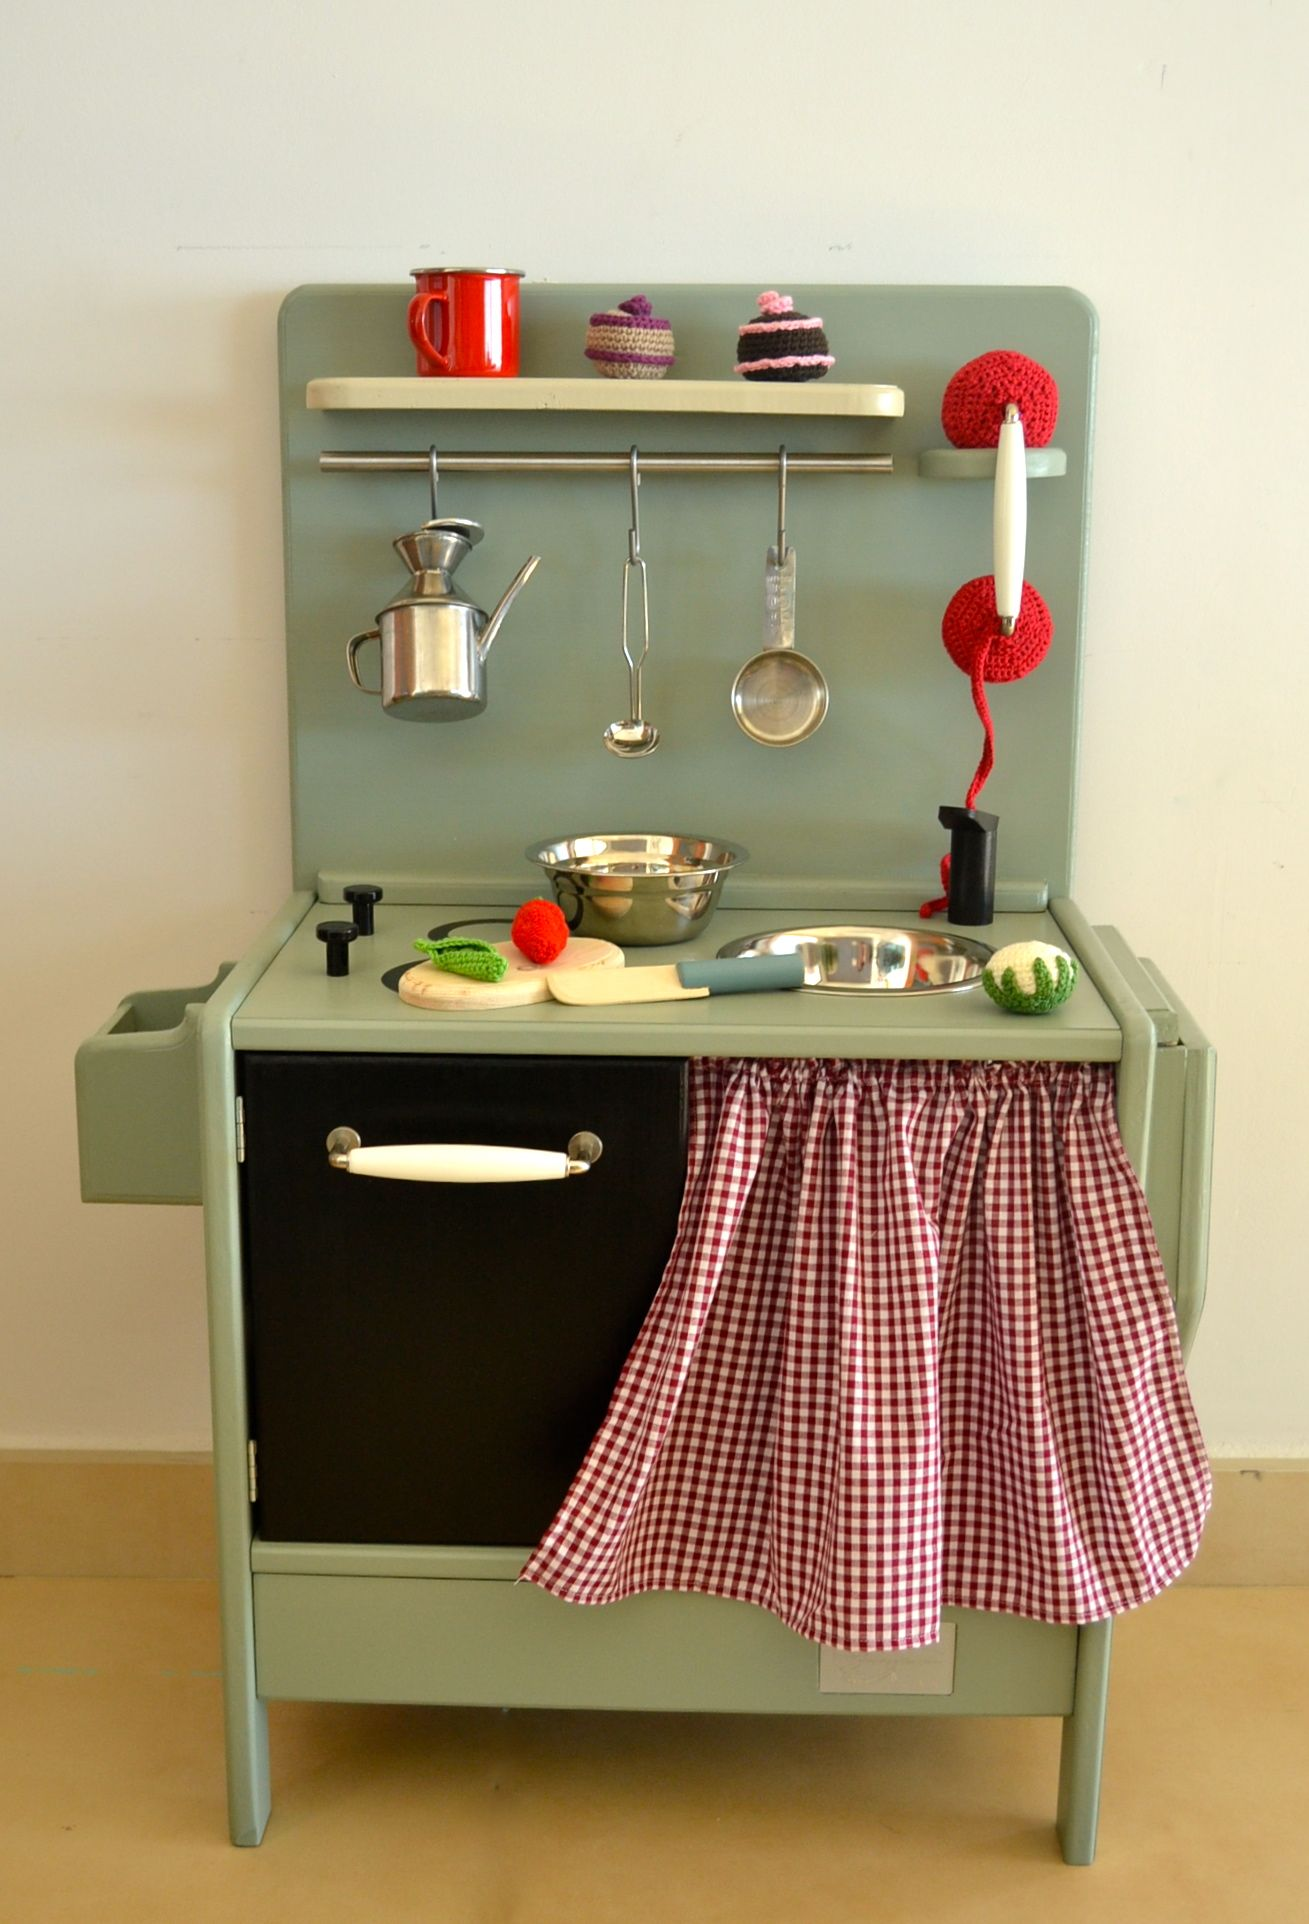 Wooden toy kitchen. woodentoys Wooden toy kitchen